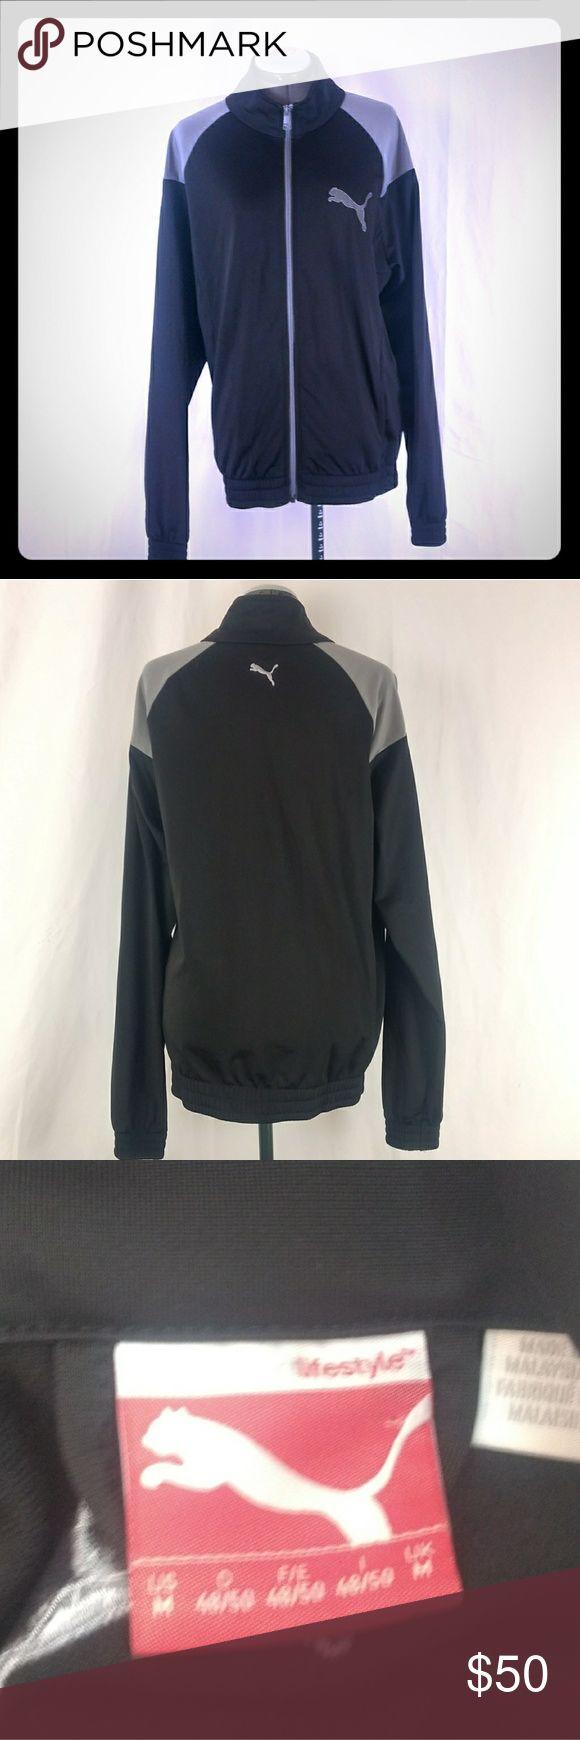 Puma Jacket Full Zip Black Medium Puma Jacket Full Zip Black   Size Medium Puma Jackets & Coats Performance Jackets